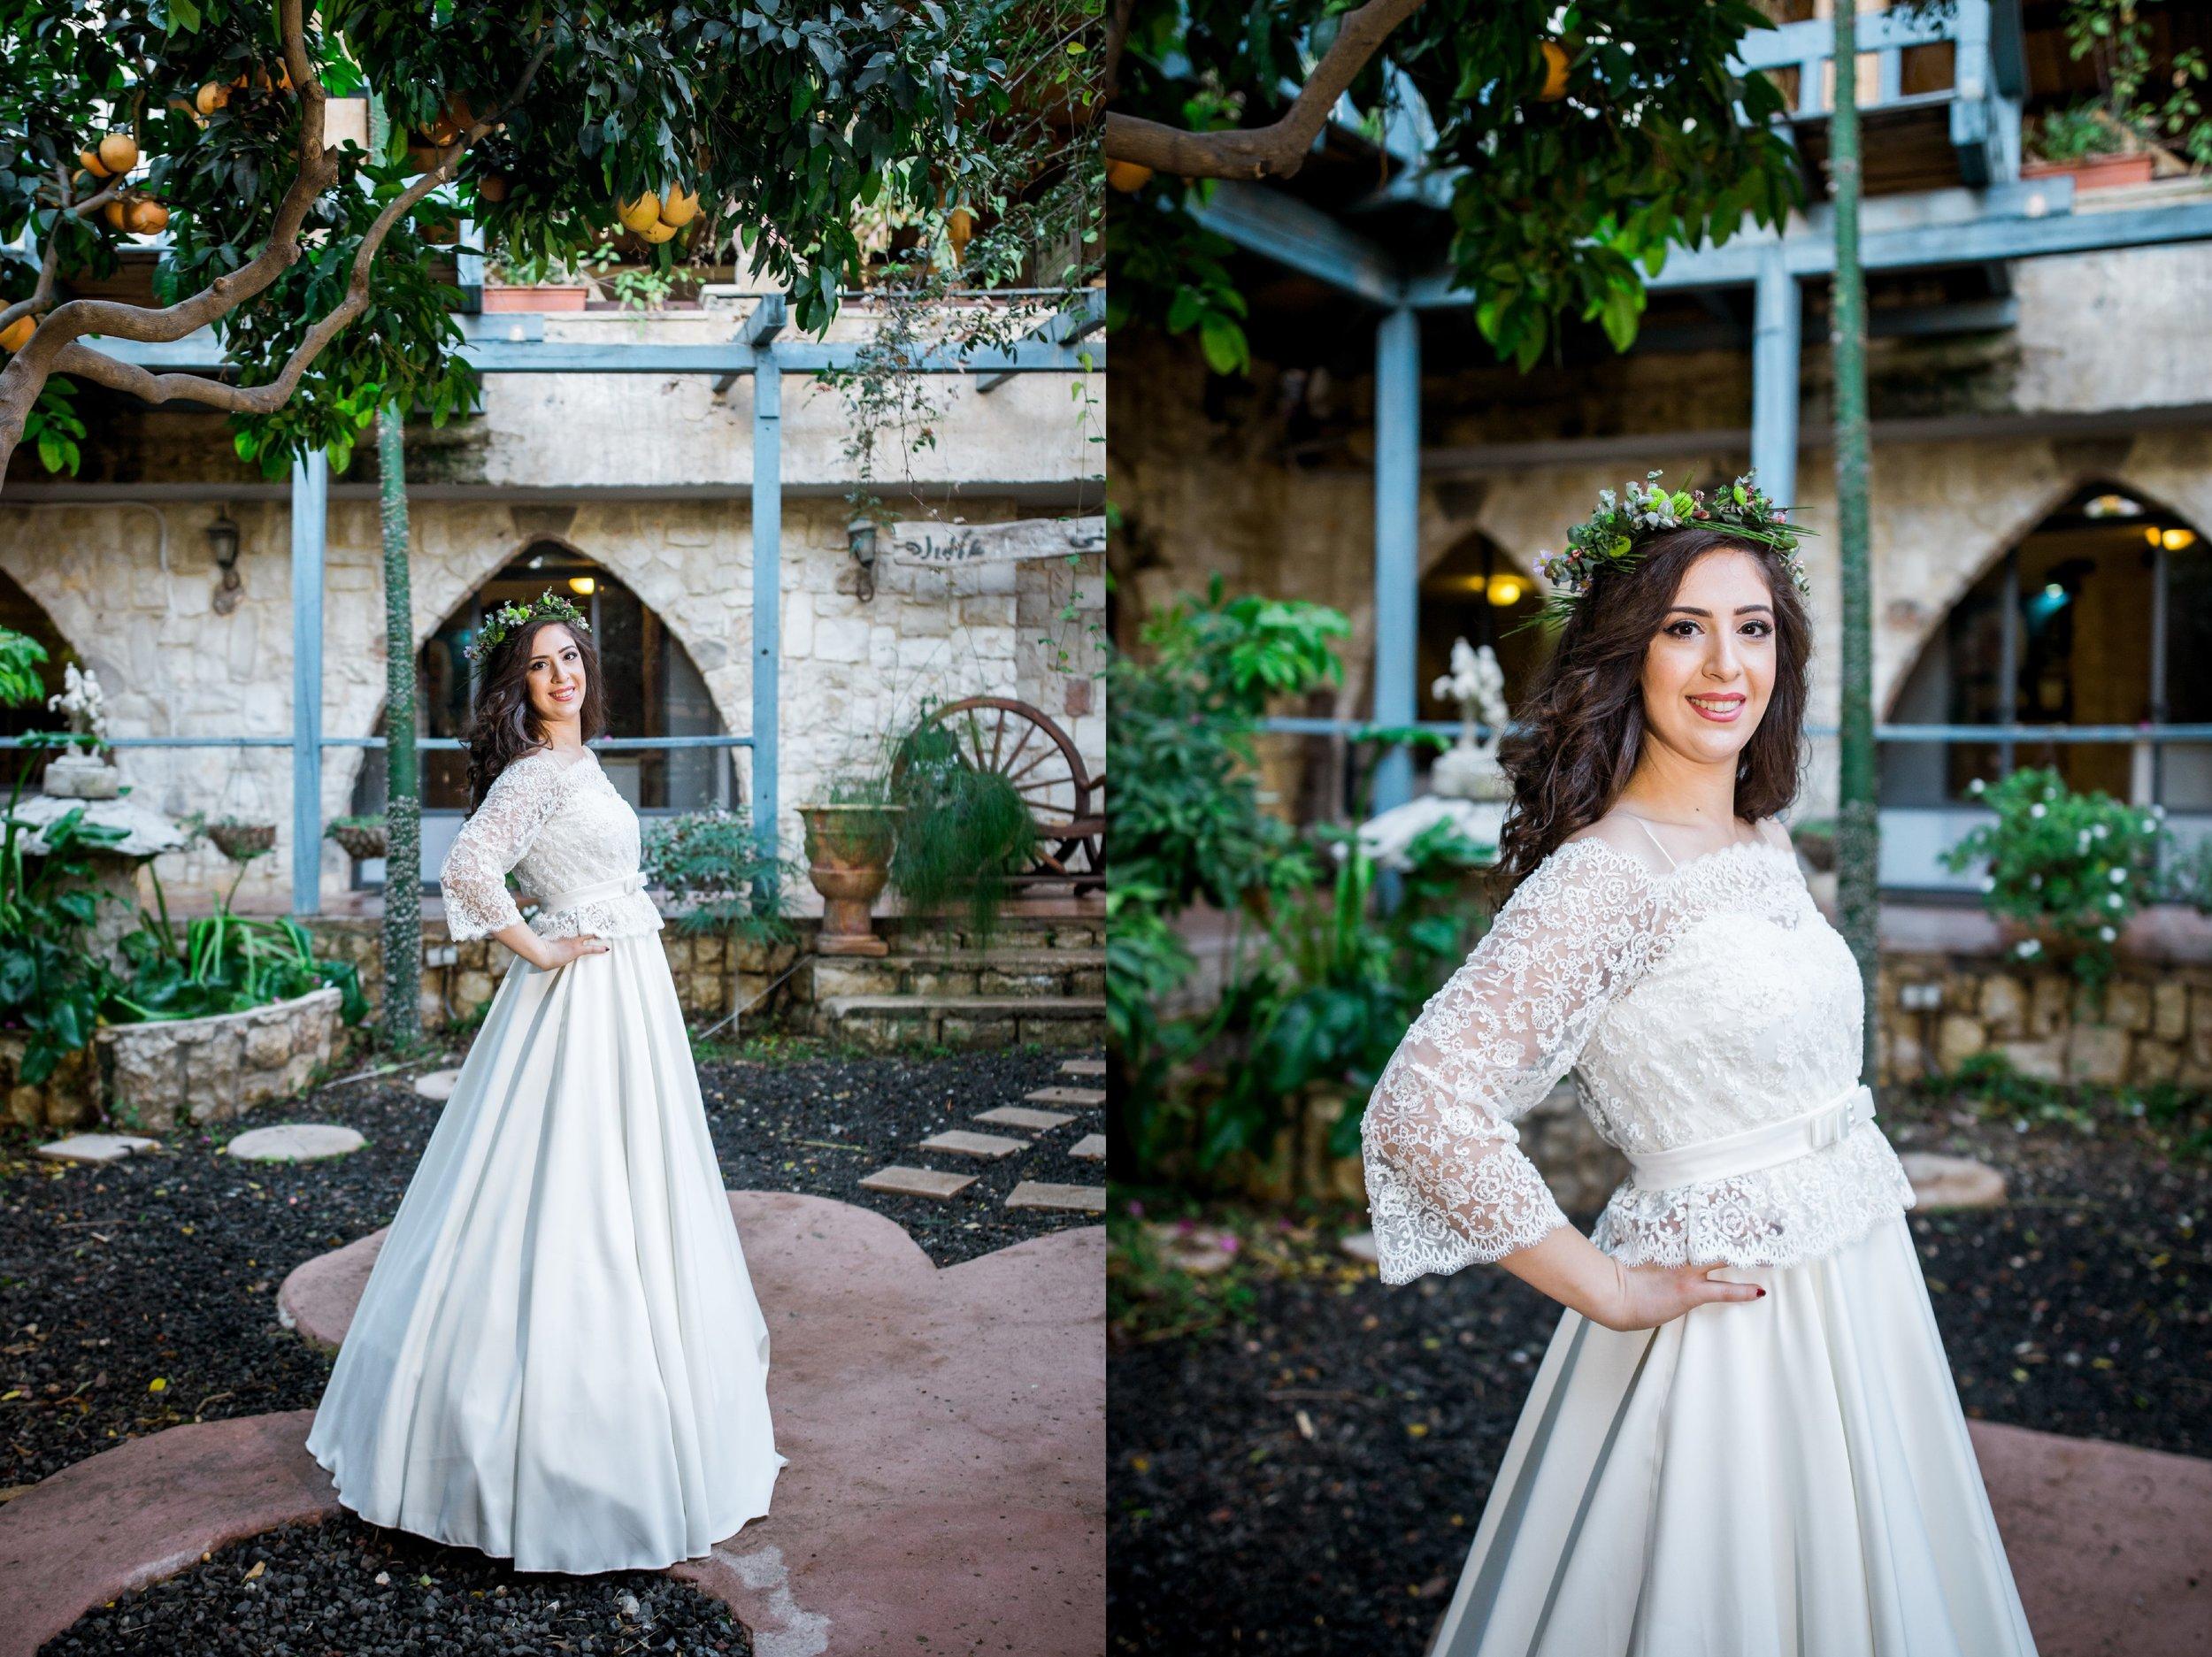 israel-garden-wedding-portraits-session-kate-giryes-photography--4_WEB.jpg